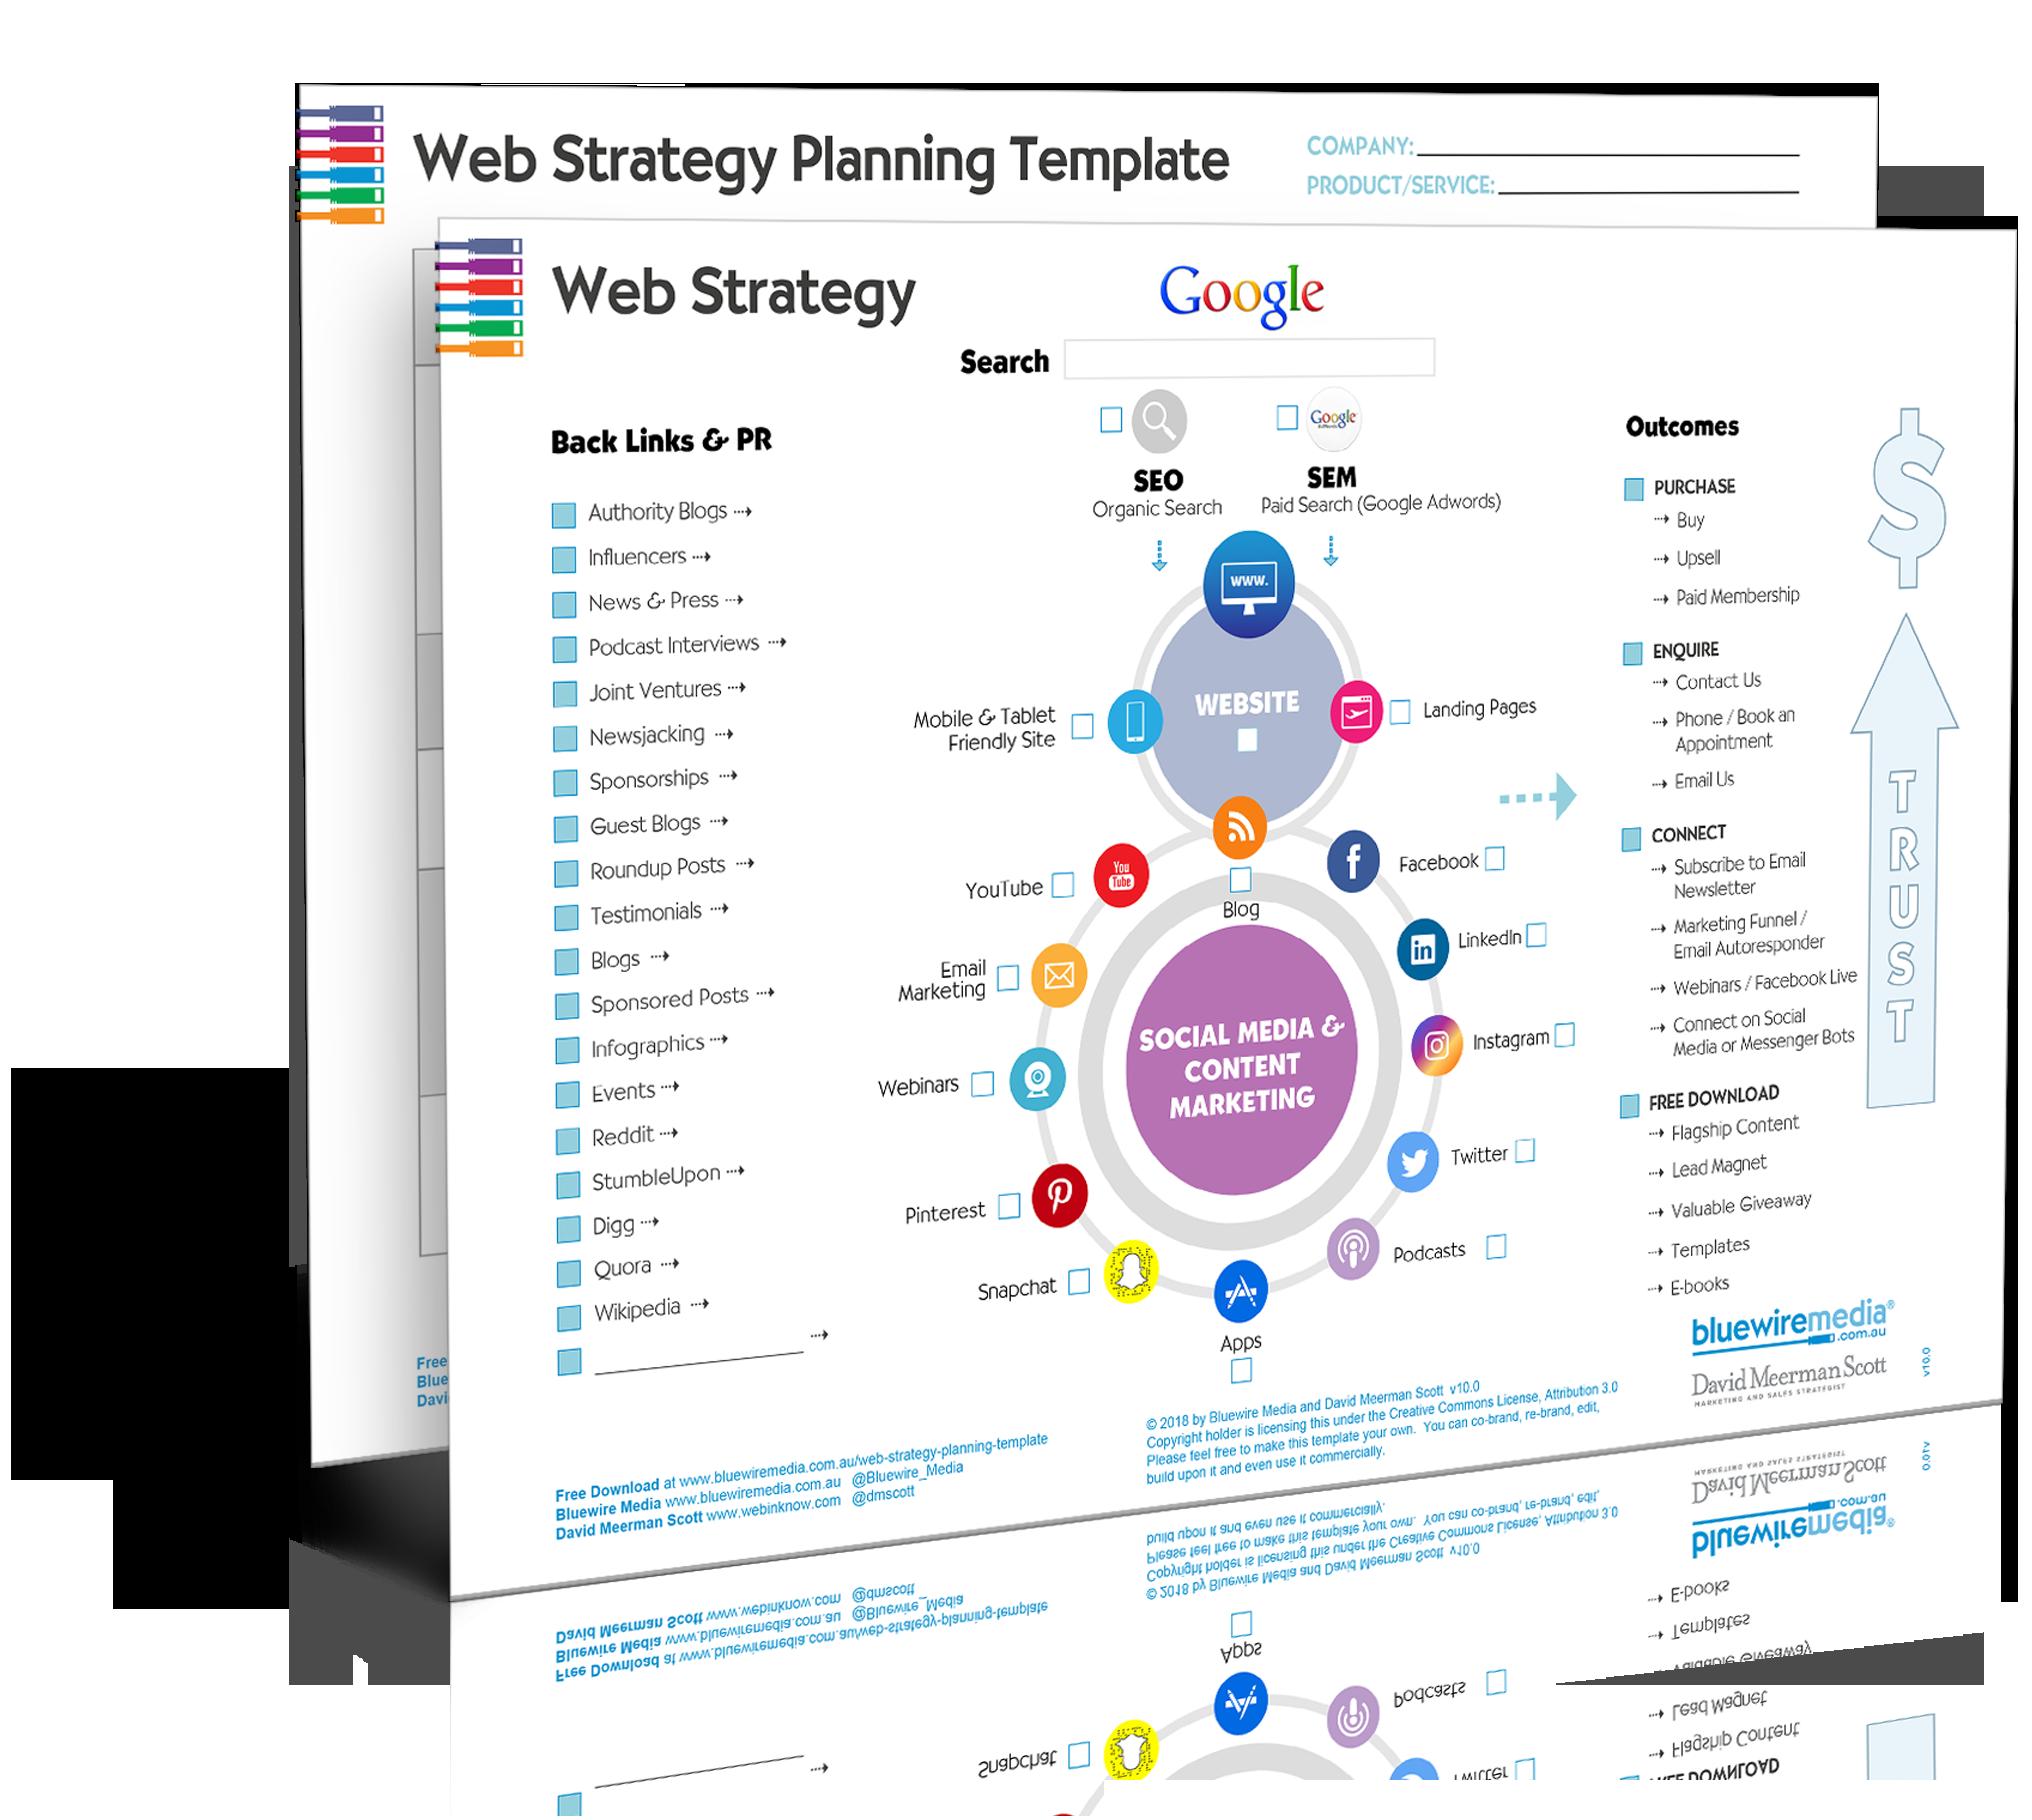 Digital Online Marketing Web Strategy Planning Template 2019